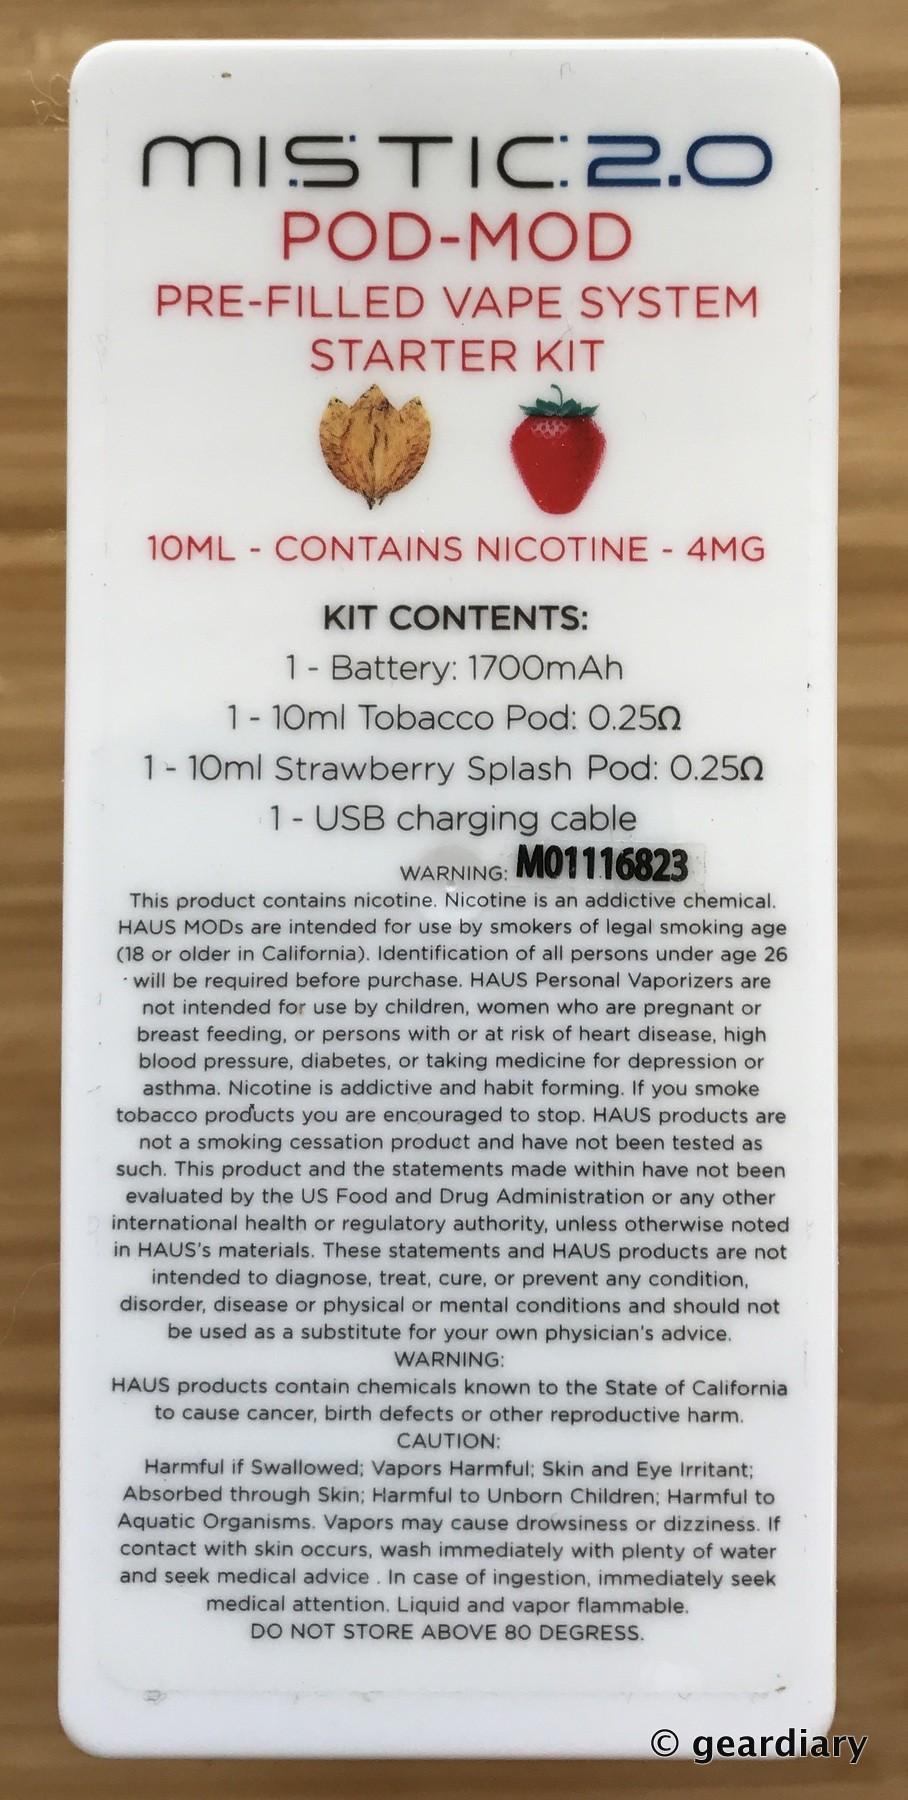 Mistic 2 0 POD-MOD Pre-filled Vape System Starter Kit Review